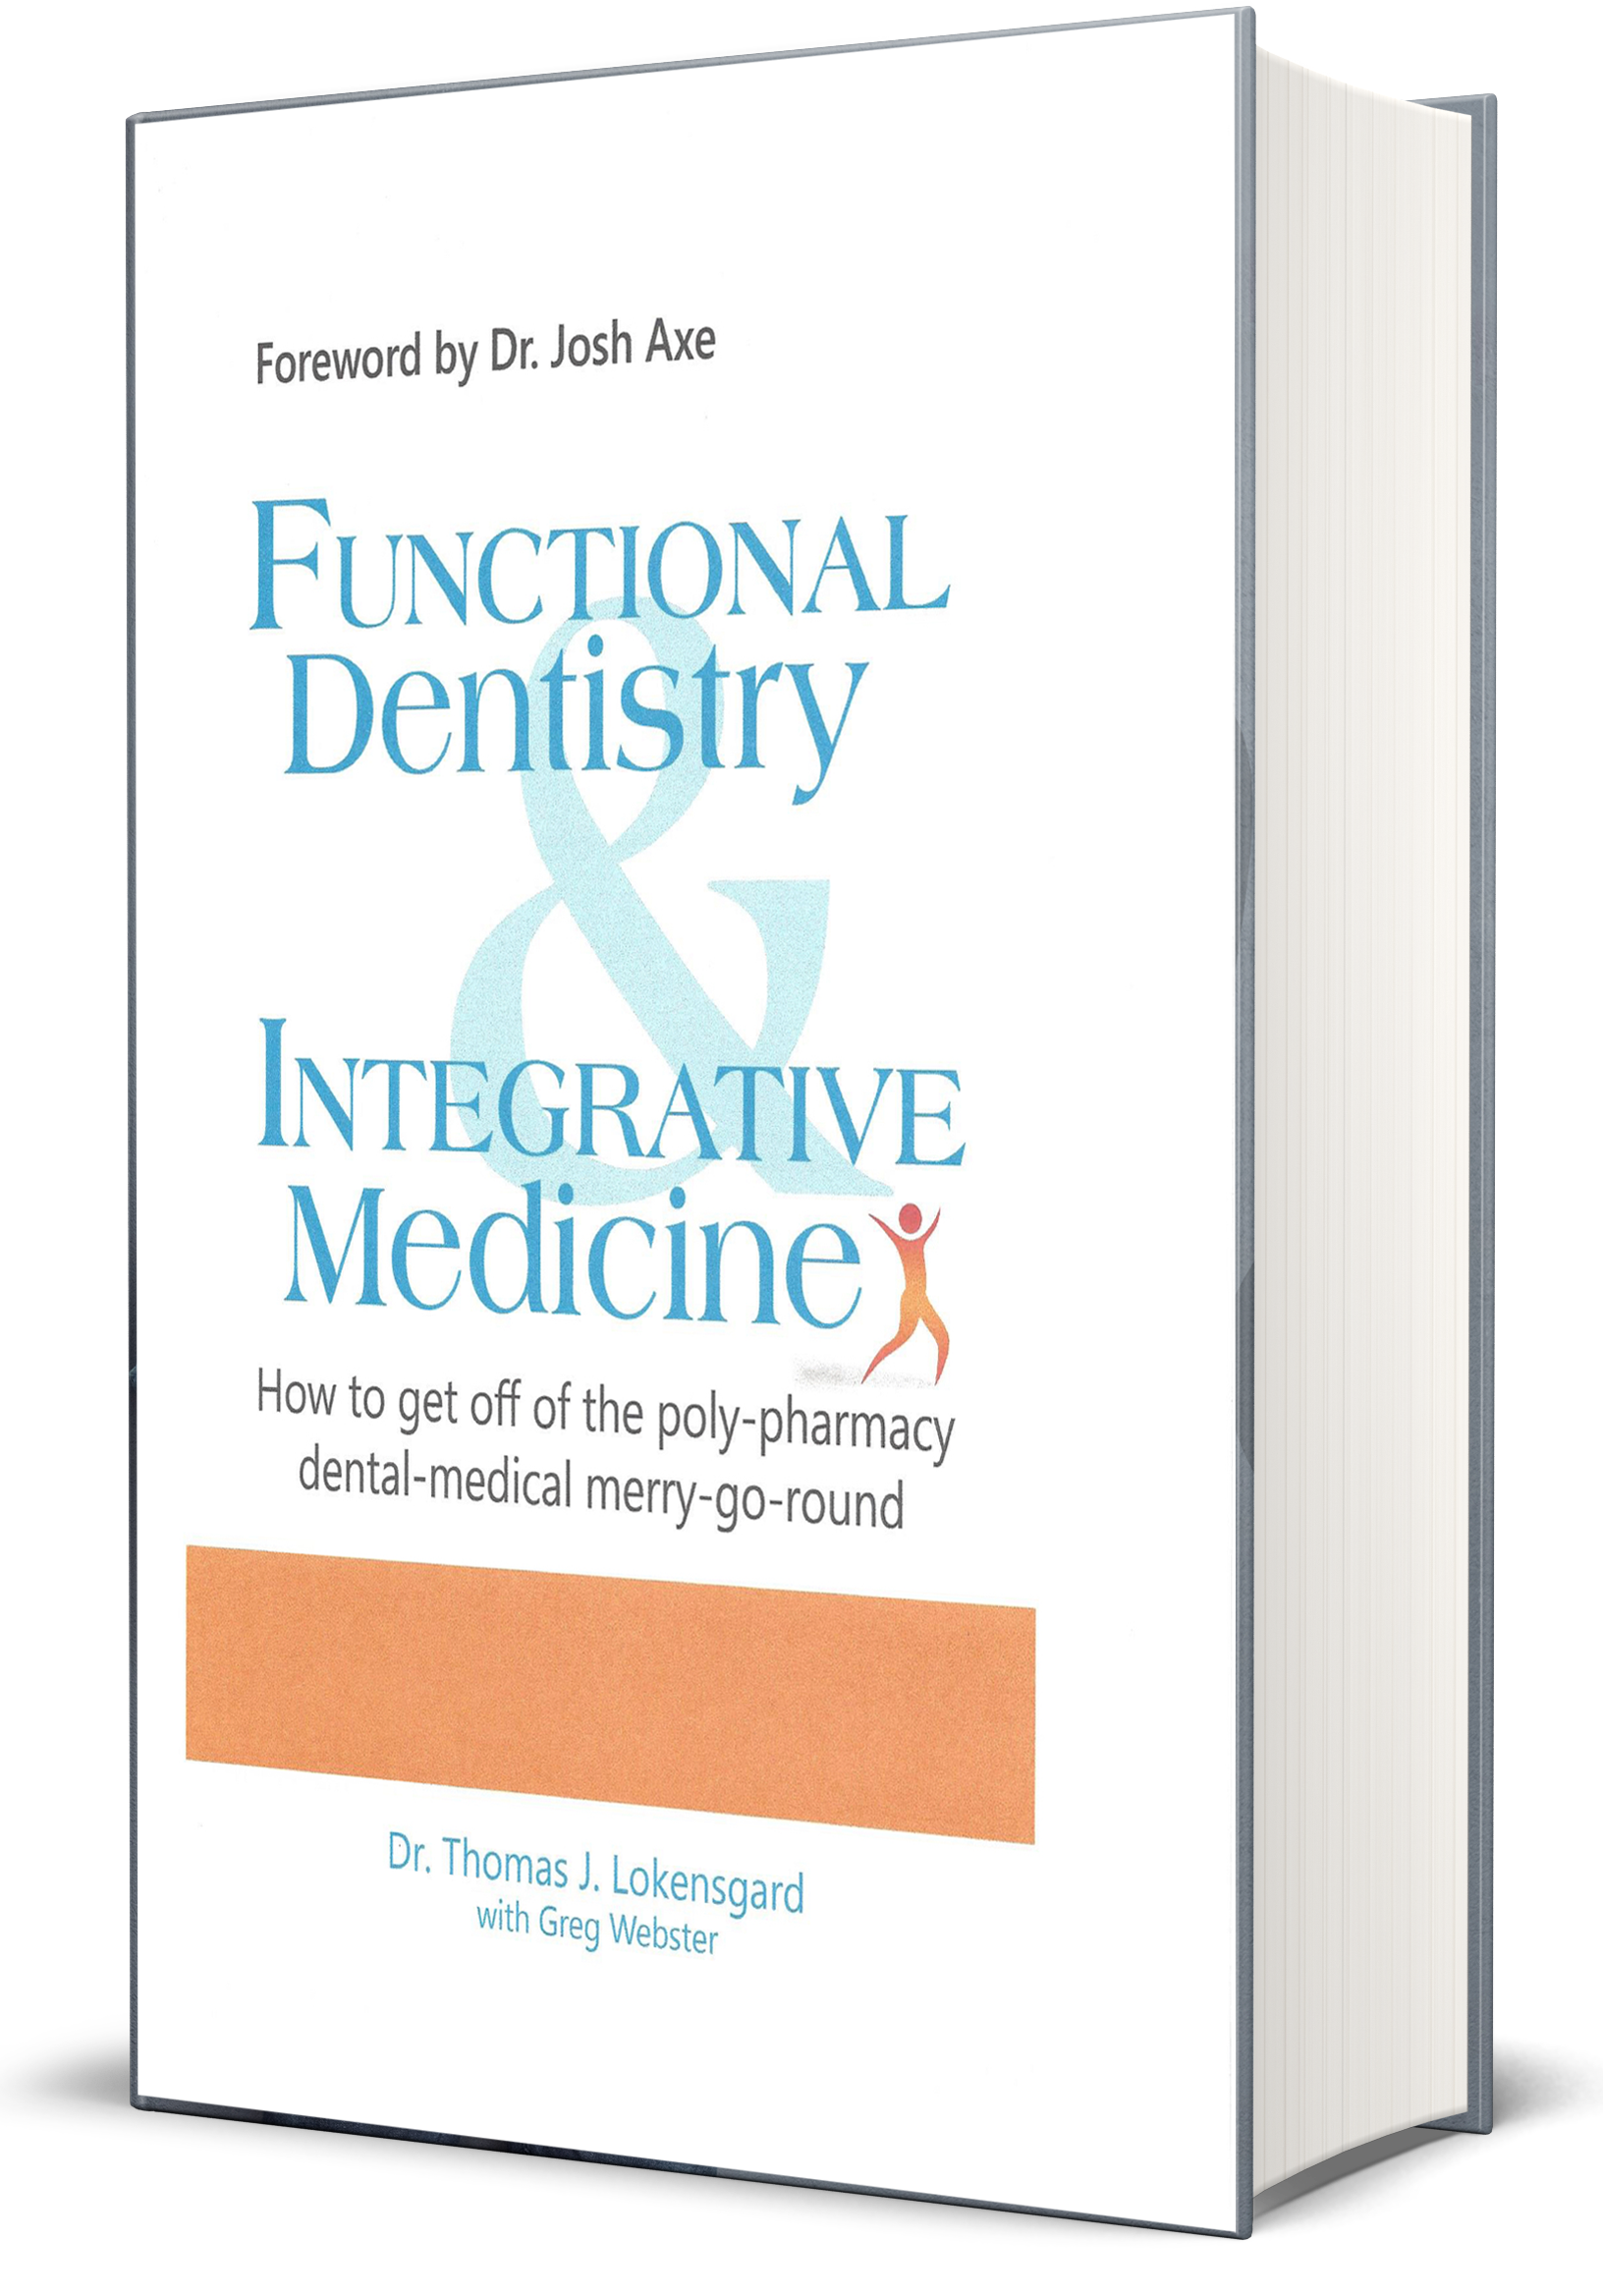 Functional Dentistry & Integrative Medicine